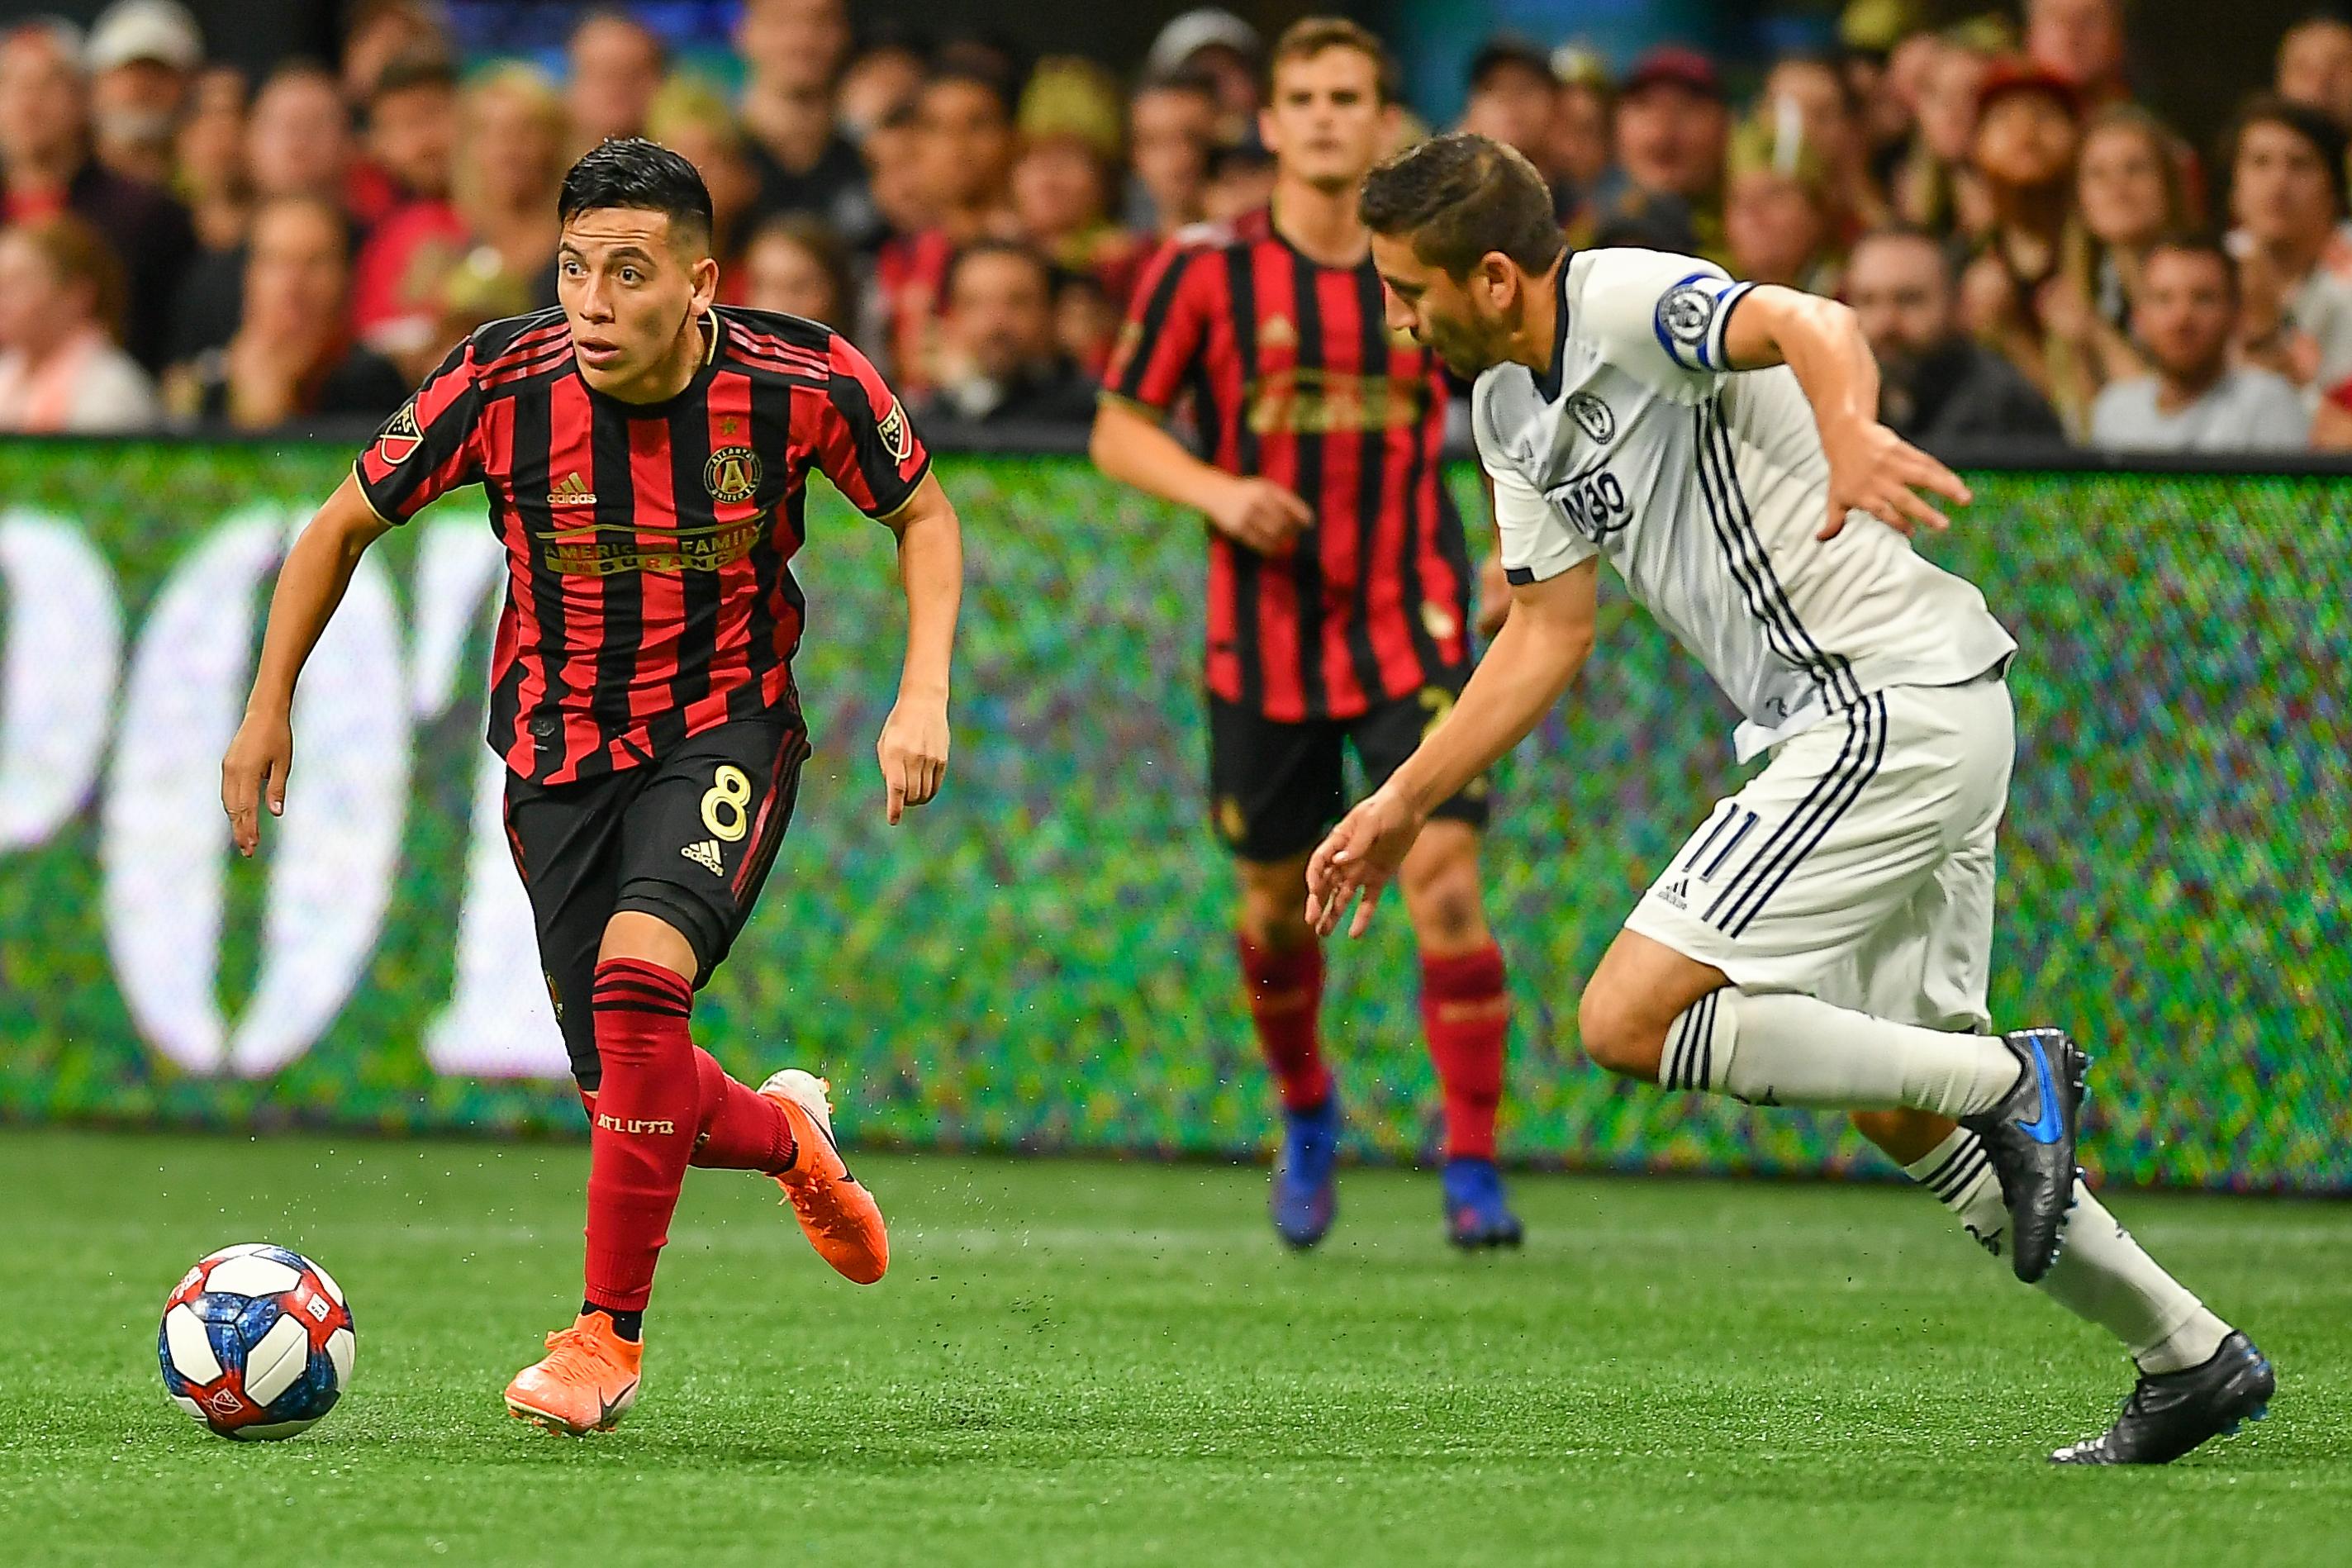 SOCCER: OCT 24 MLS Cup Playoffs - Philadelphia Union at Atlanta United FC